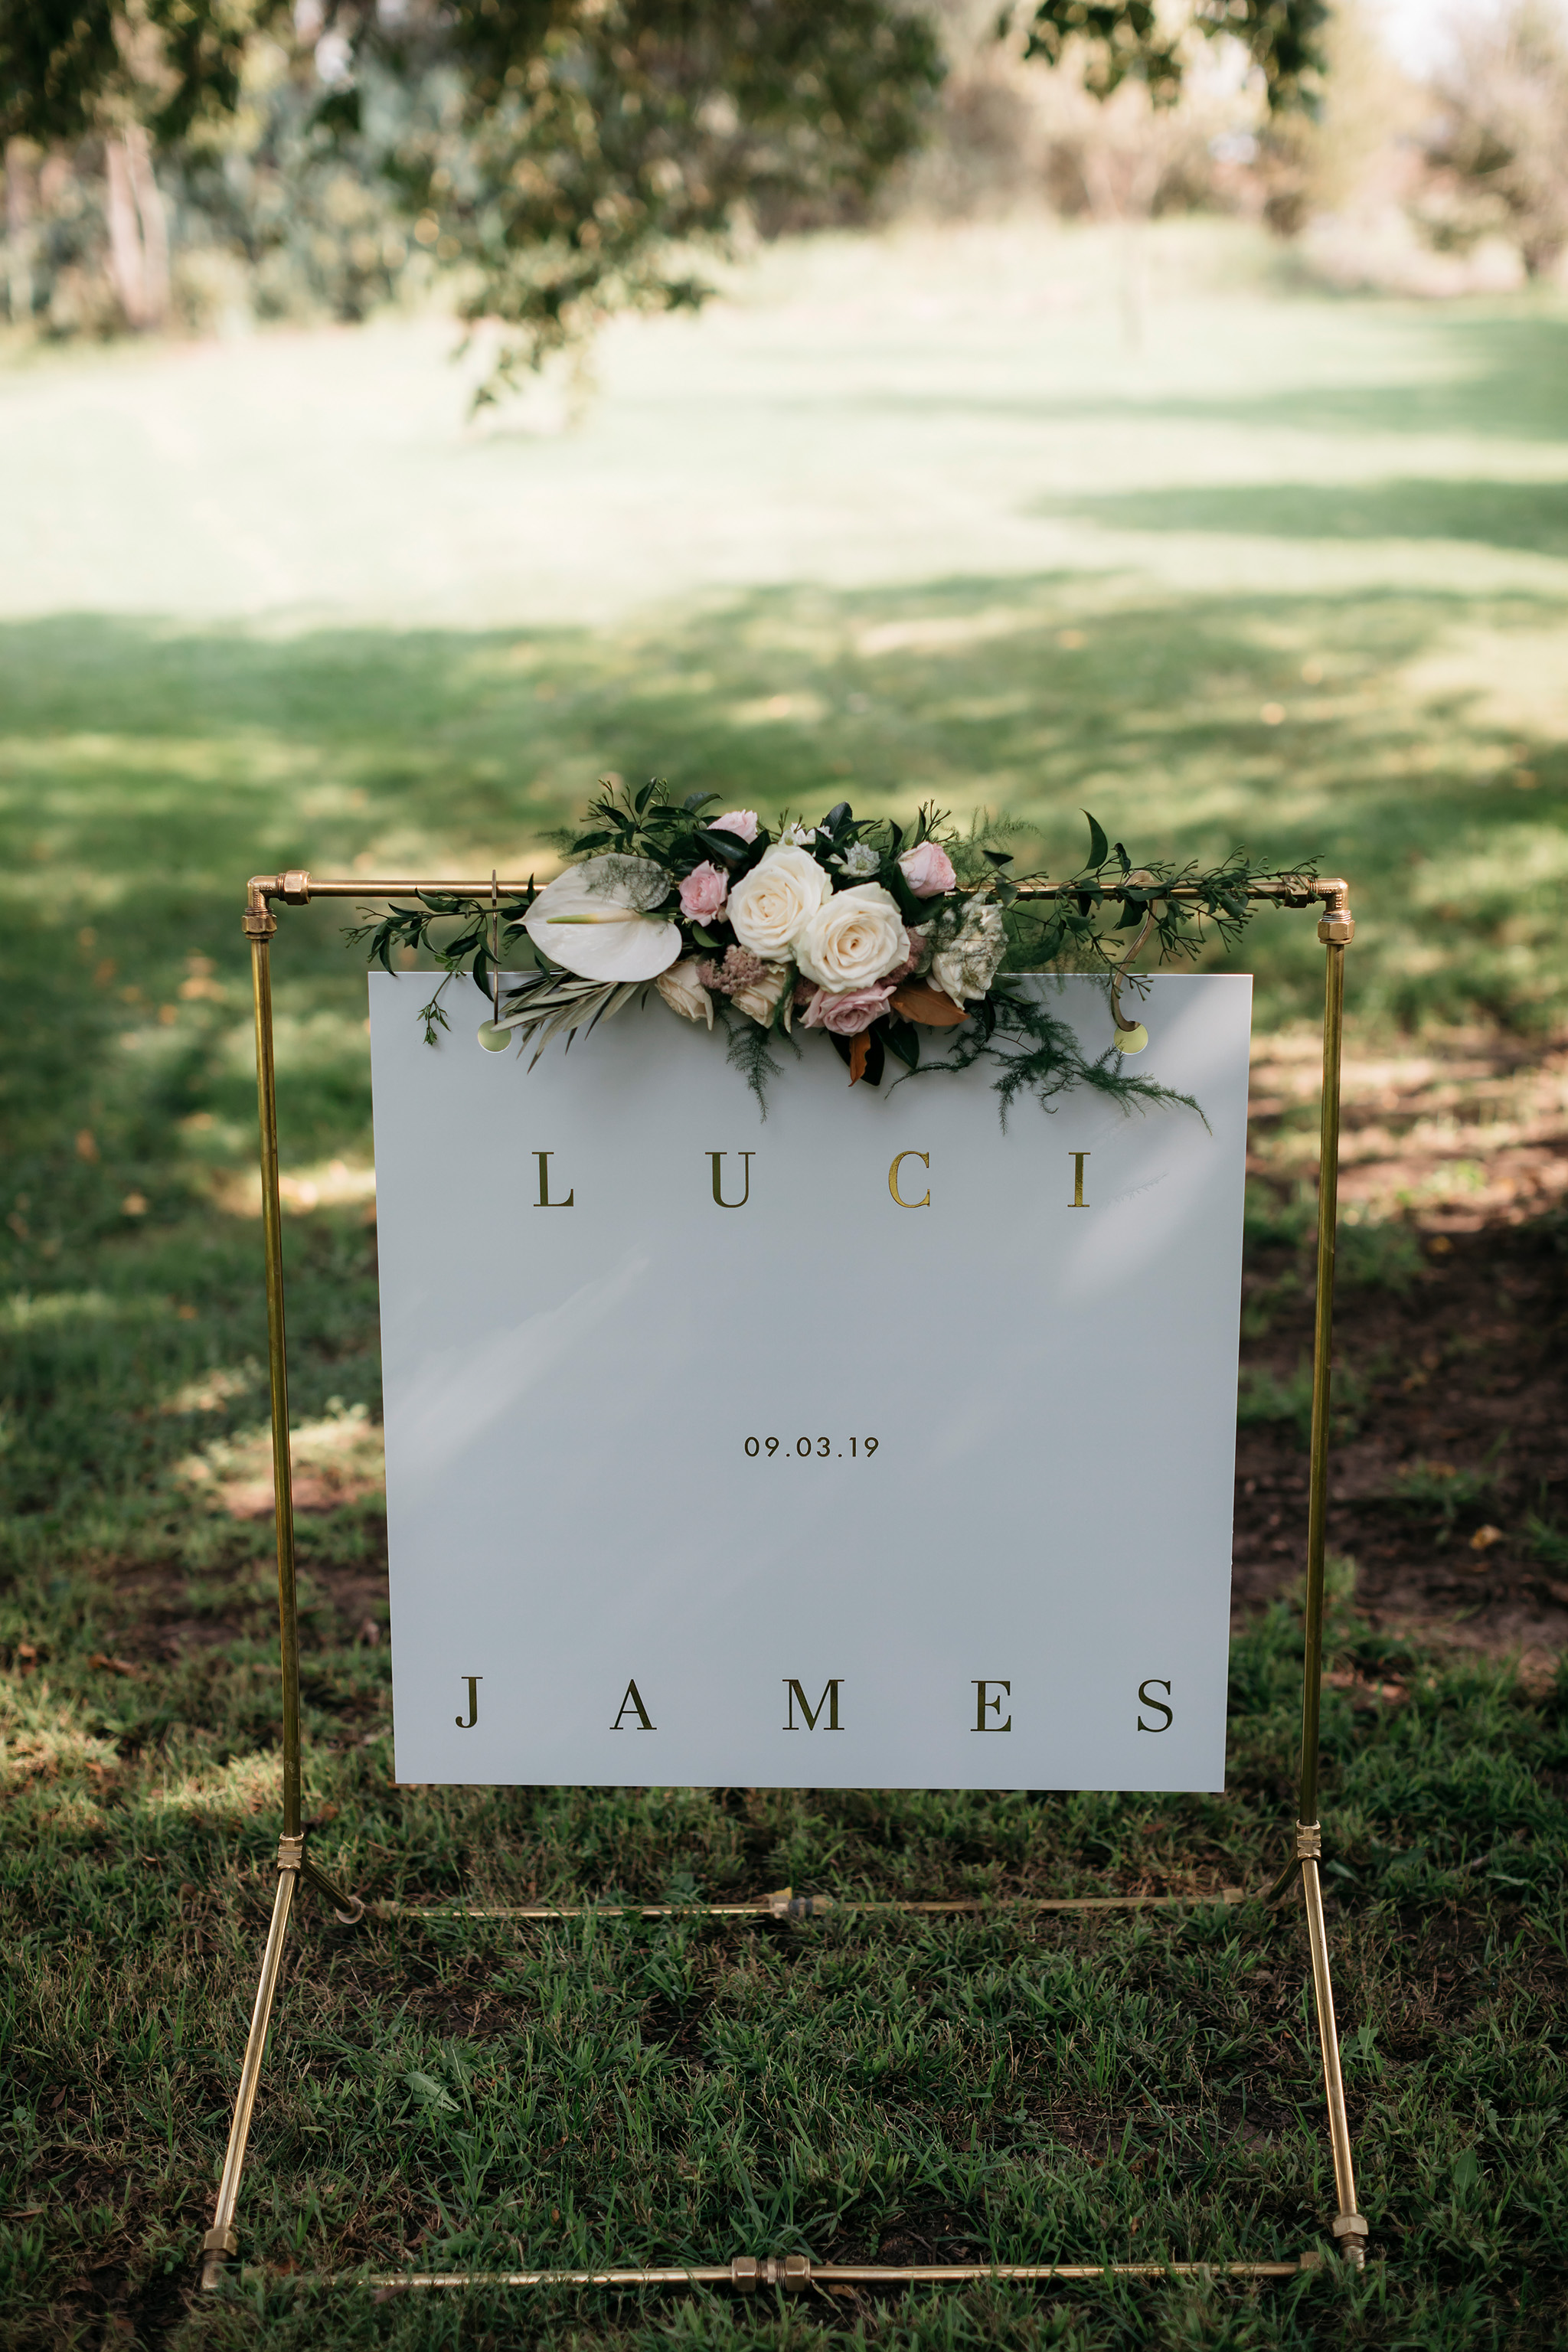 Luci+James_KatieHarmsworth-198.jpg